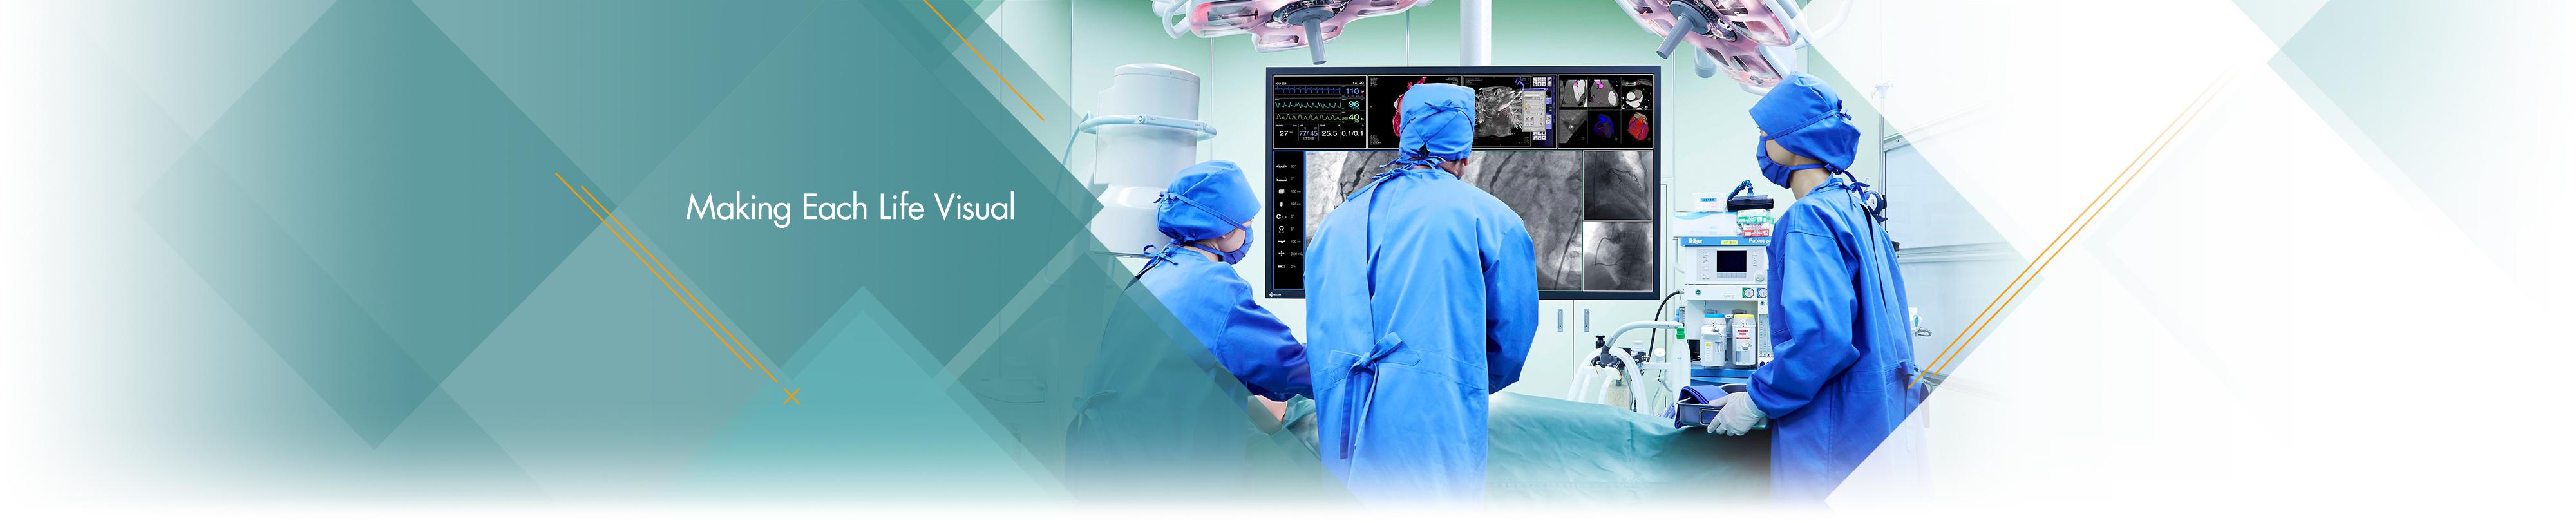 Healthcare Treatment and Surgery | EIZO